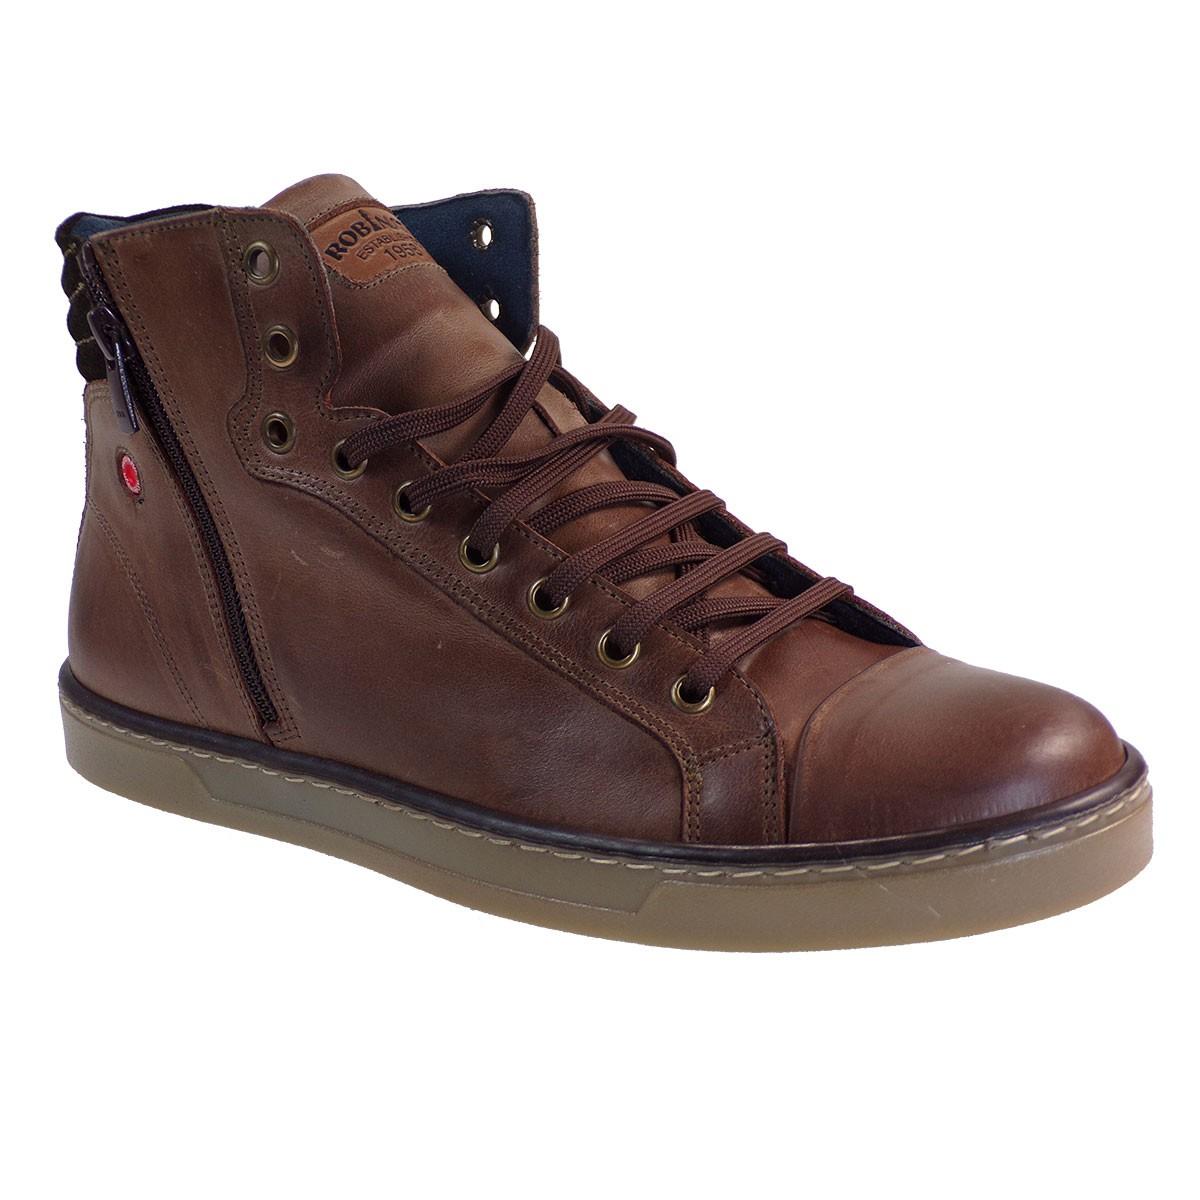 Robinson Ανδρικά Παπούτσια Μποτάκια Sneakers 2313 Καφέ Δέρμα